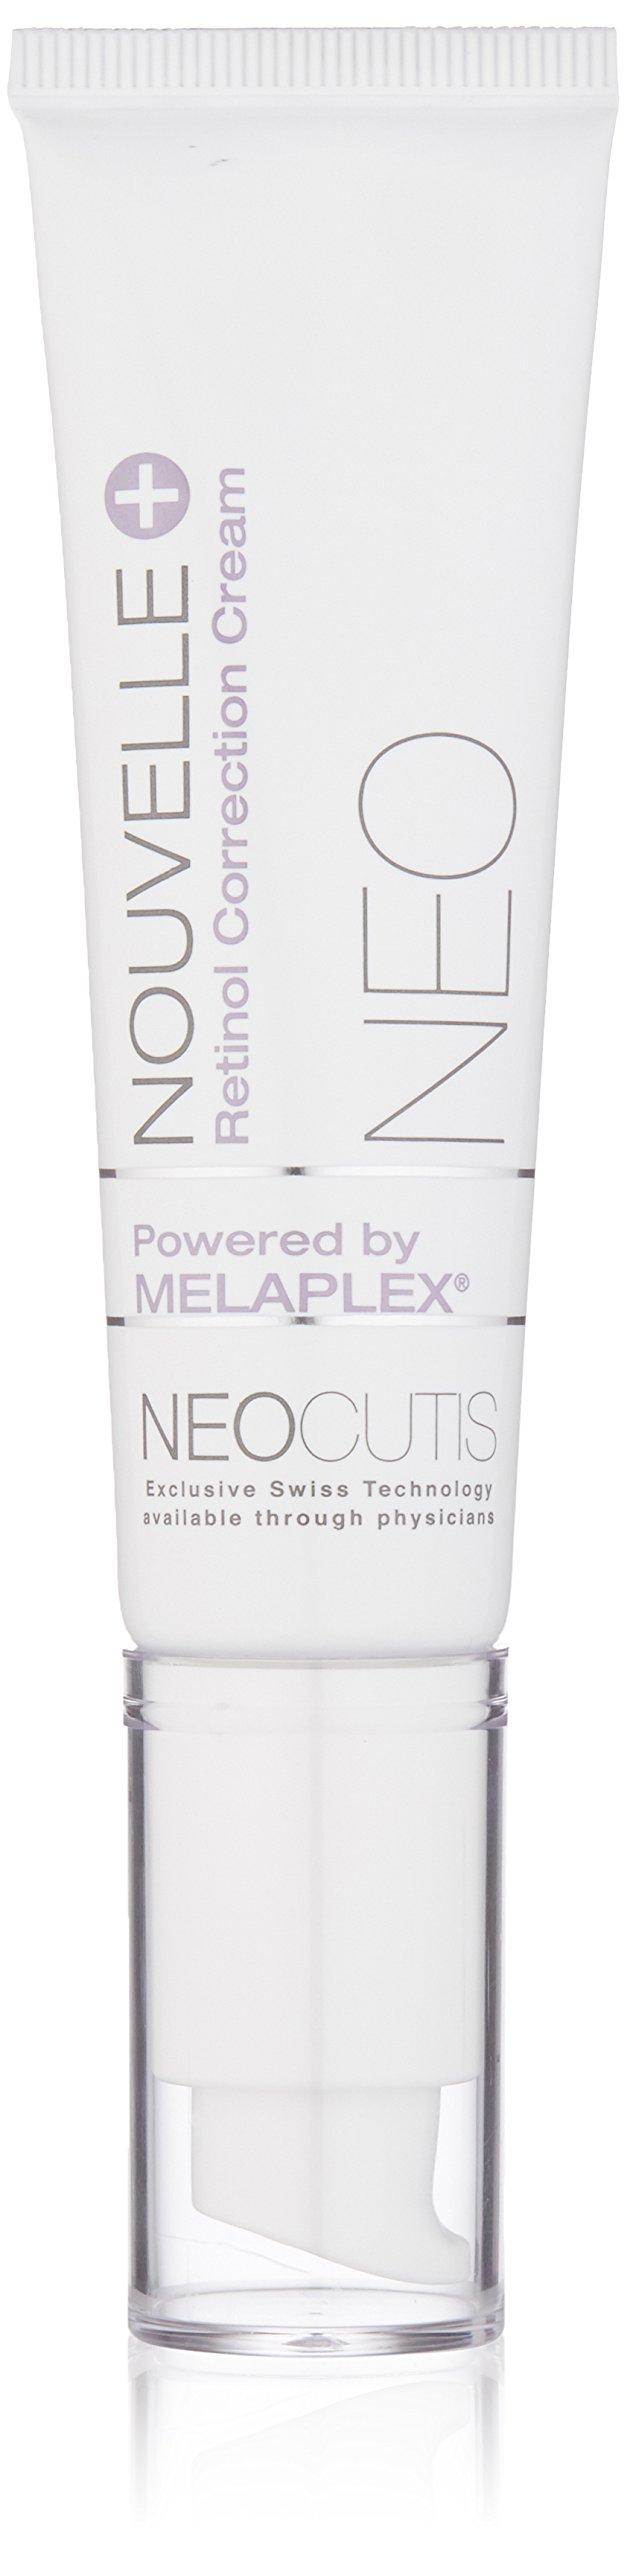 NEOCUTIS Nouvelle Plus Retinol Correction Cream, 1 Fl Oz by NEOCUTIS (Image #1)